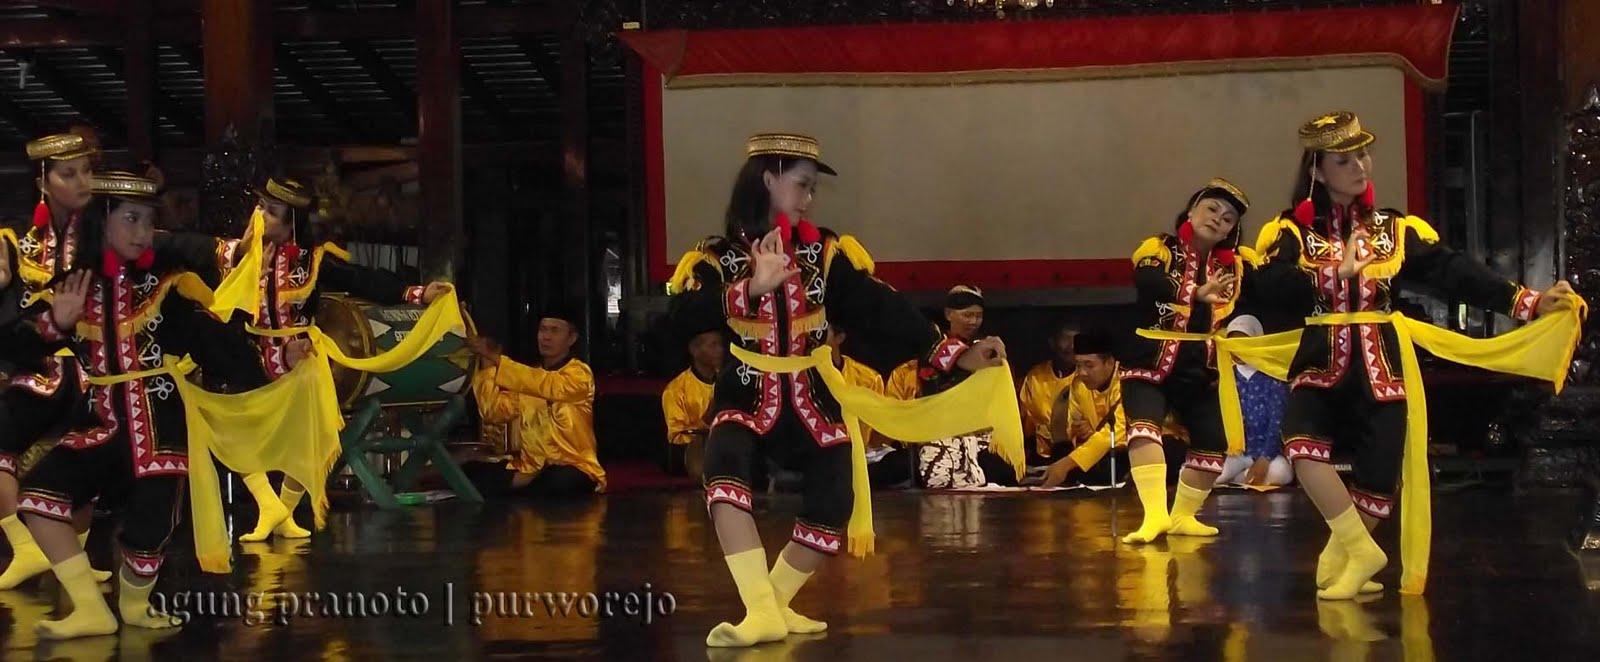 Budaya Purworejo Pagelaran Kesenian Kabupaten Anjungan Sebagaimana 2011 Tim Duta